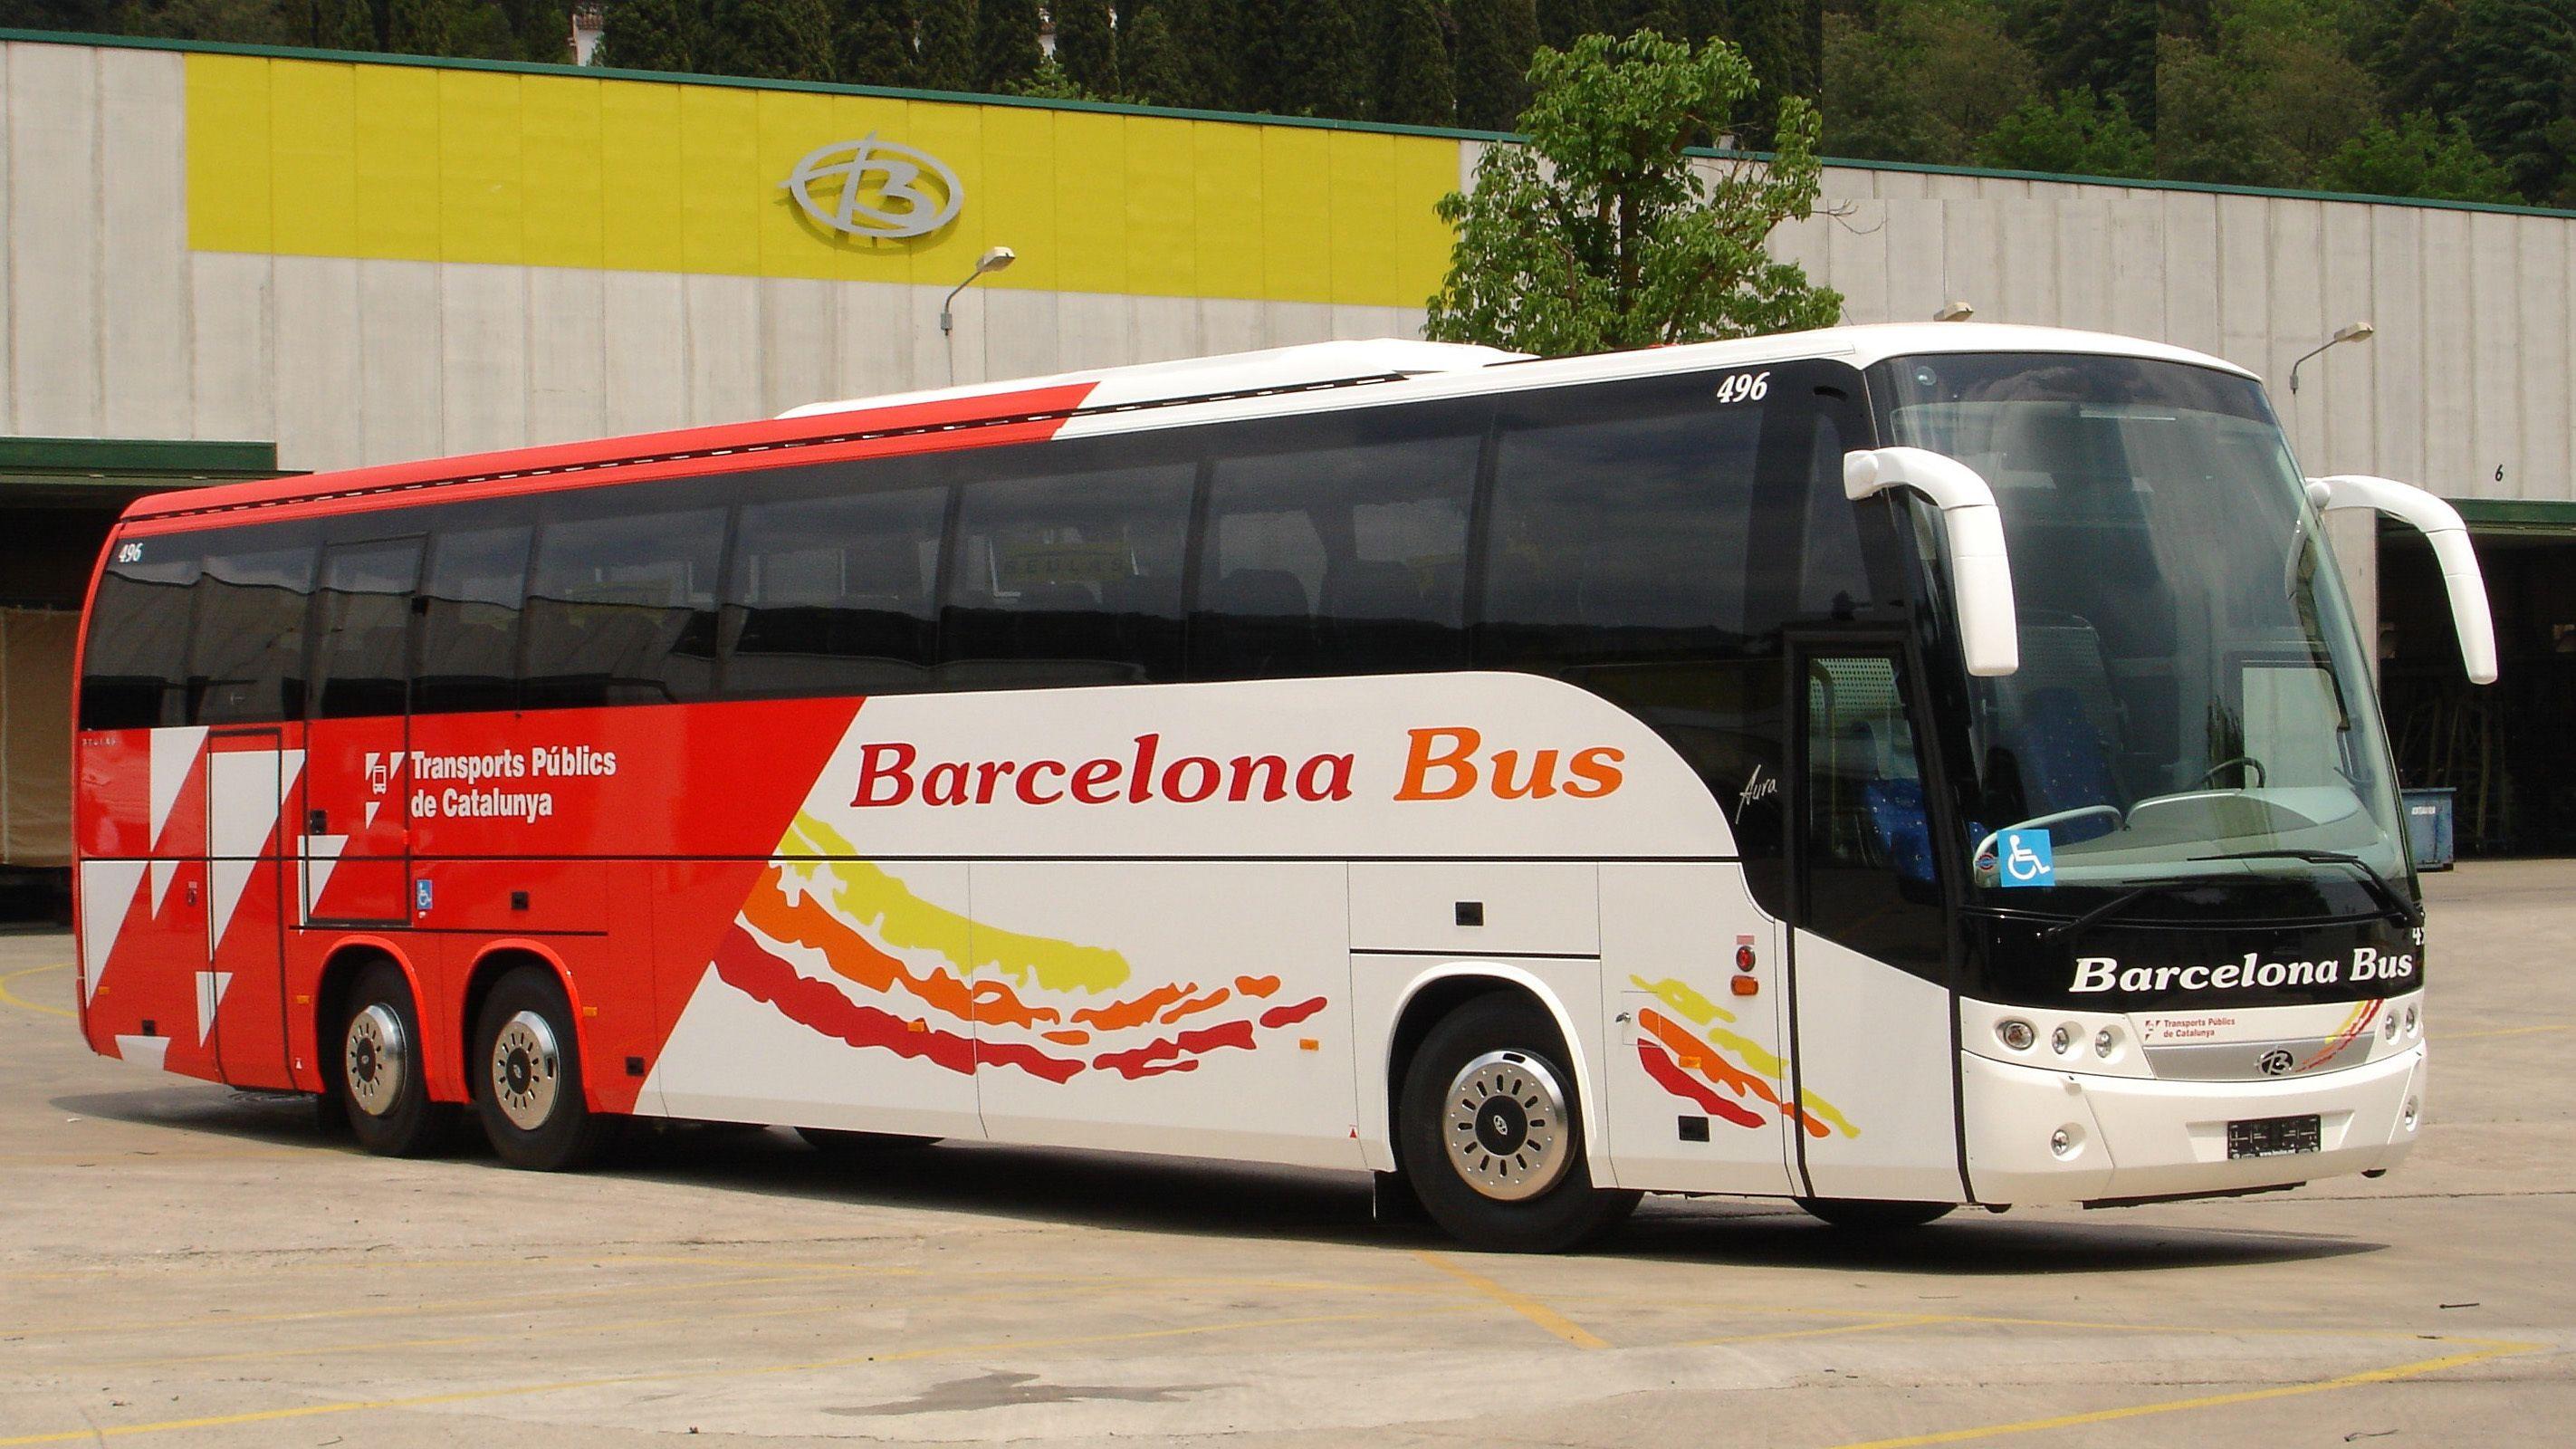 Shared Coach - Barcelona Airport (BCN) to Girona Airport (GRO)